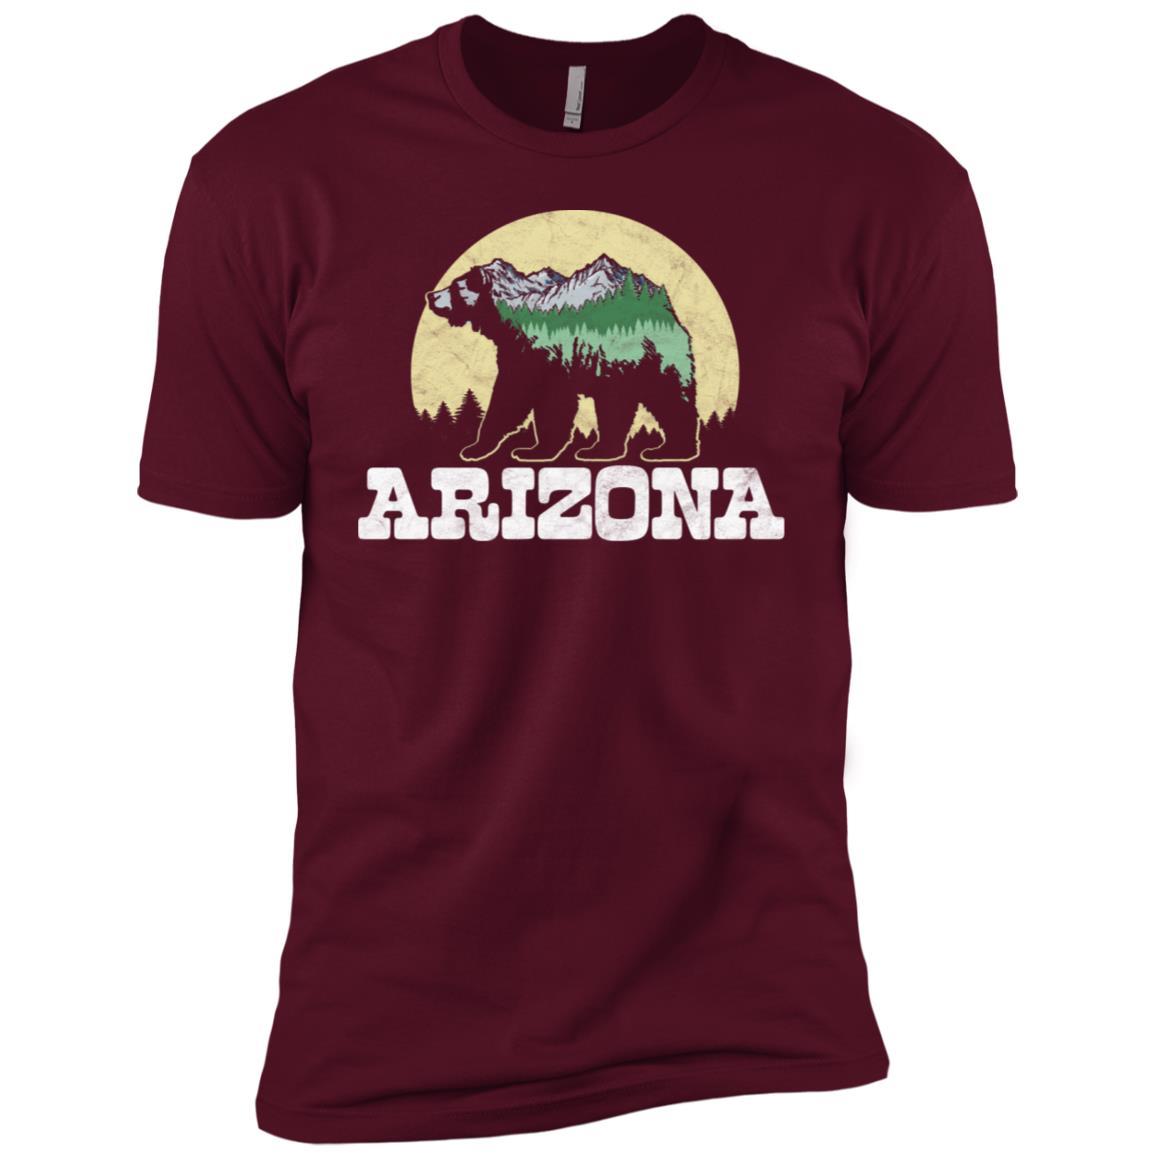 Arizona Bear Sketch Mountains & Trees Men Short Sleeve T-Shirt